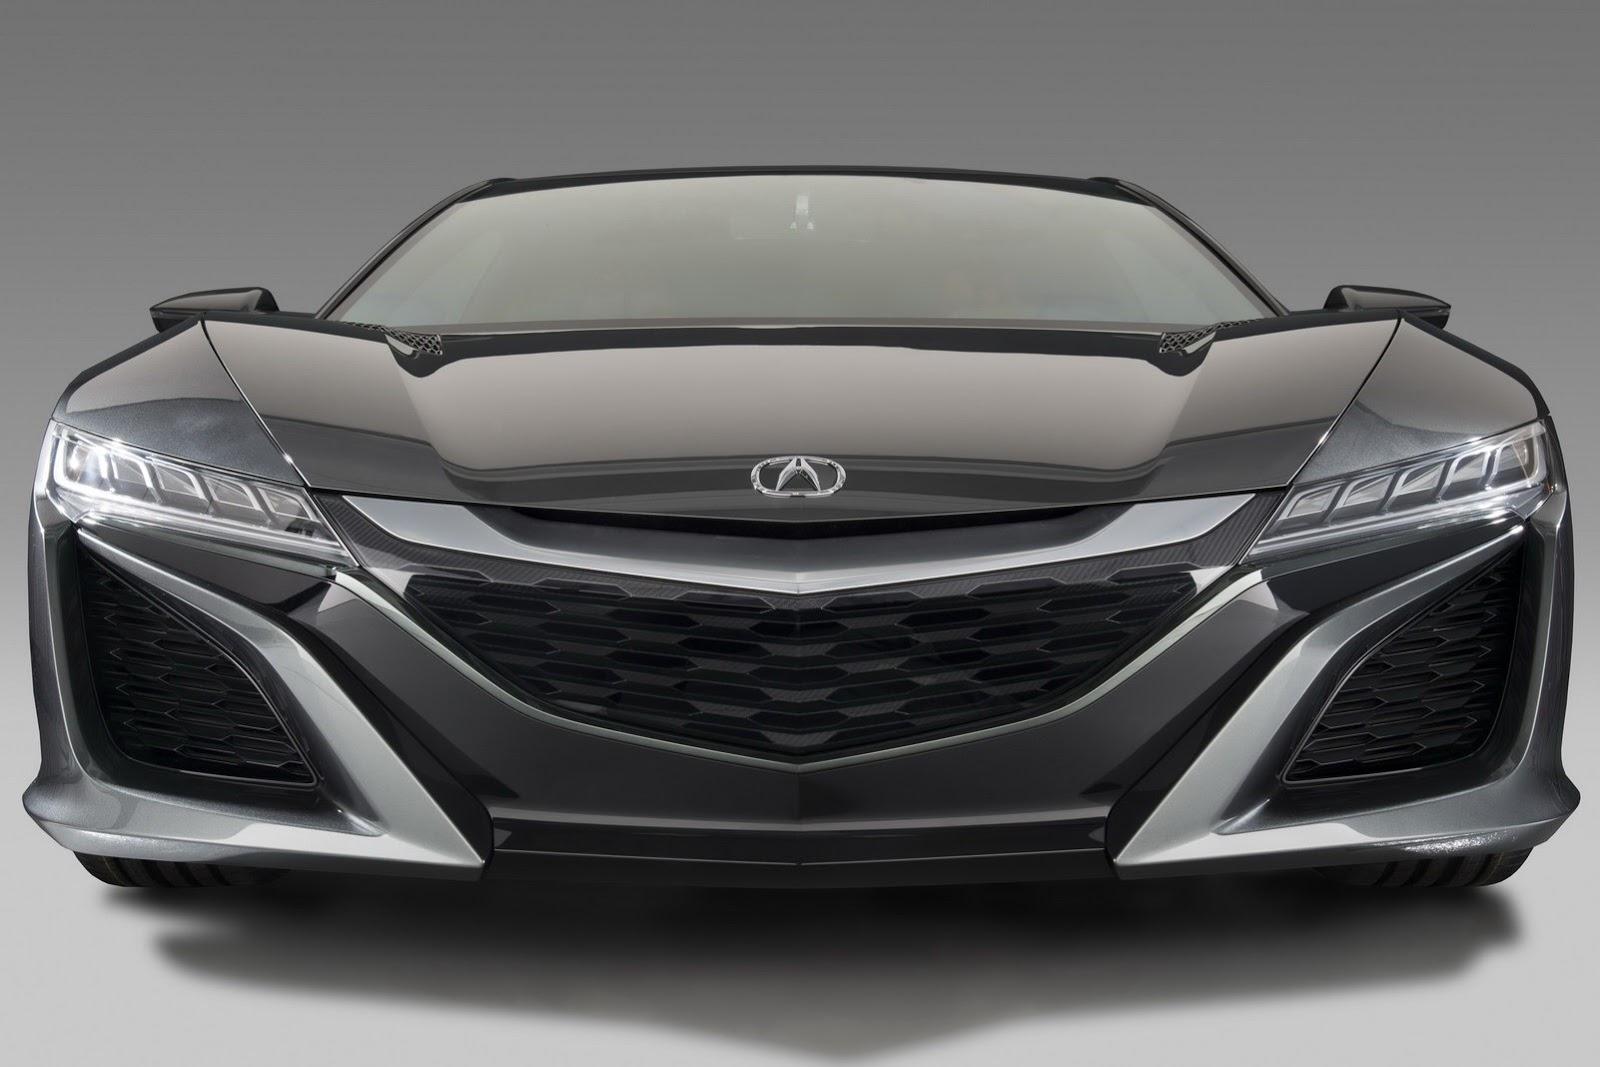 2015 - [Honda] NSX - Page 6 2015-Acura-Honda-NSX-Concept-II-14%25255B2%25255D